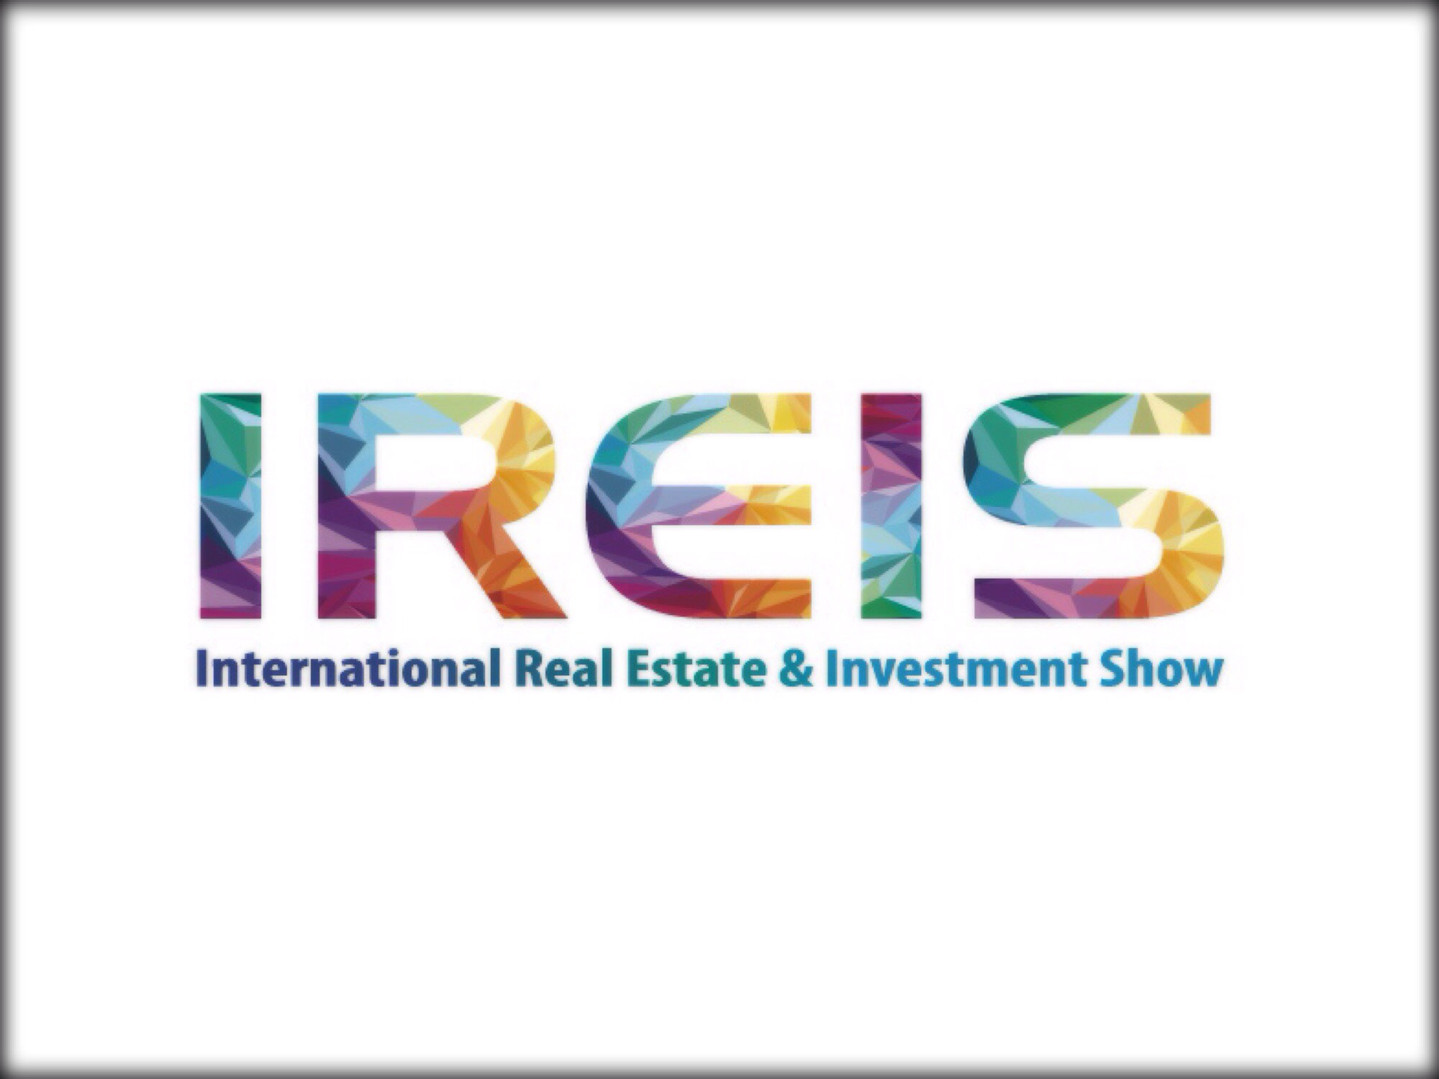 IREIS Abu Dhabi